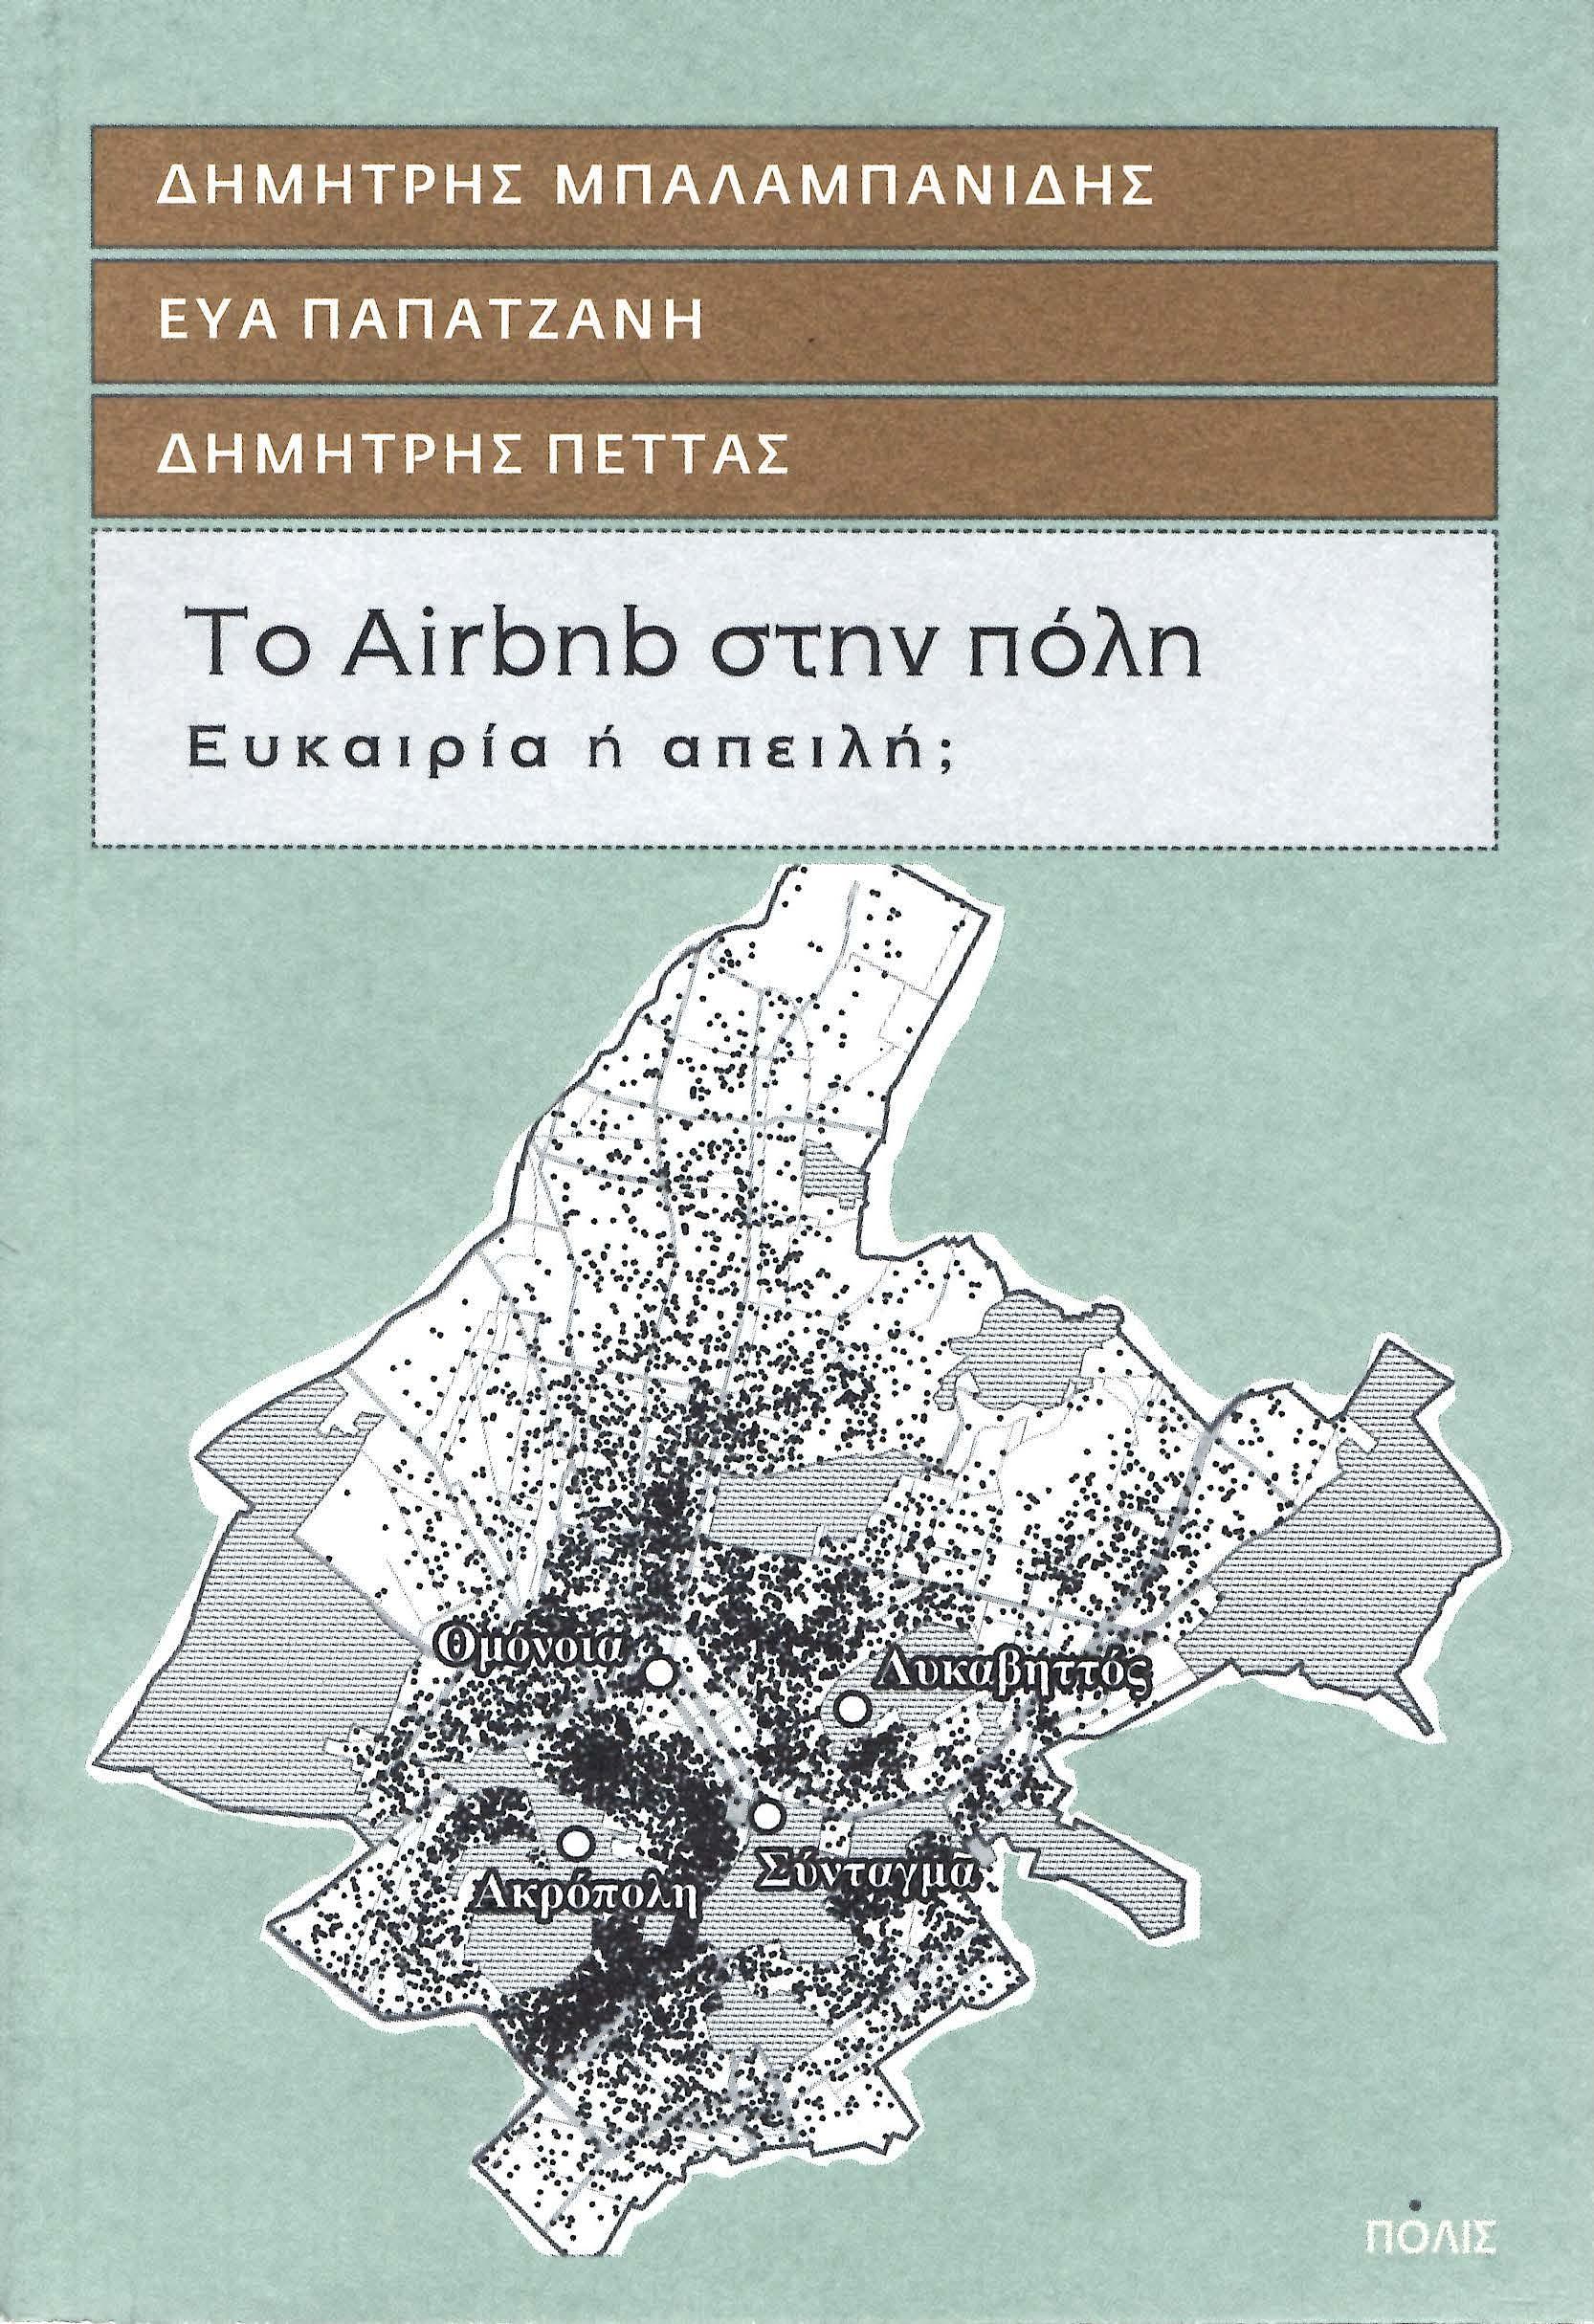 Airbnb ευκαιρία ή απειλή βιβλίο